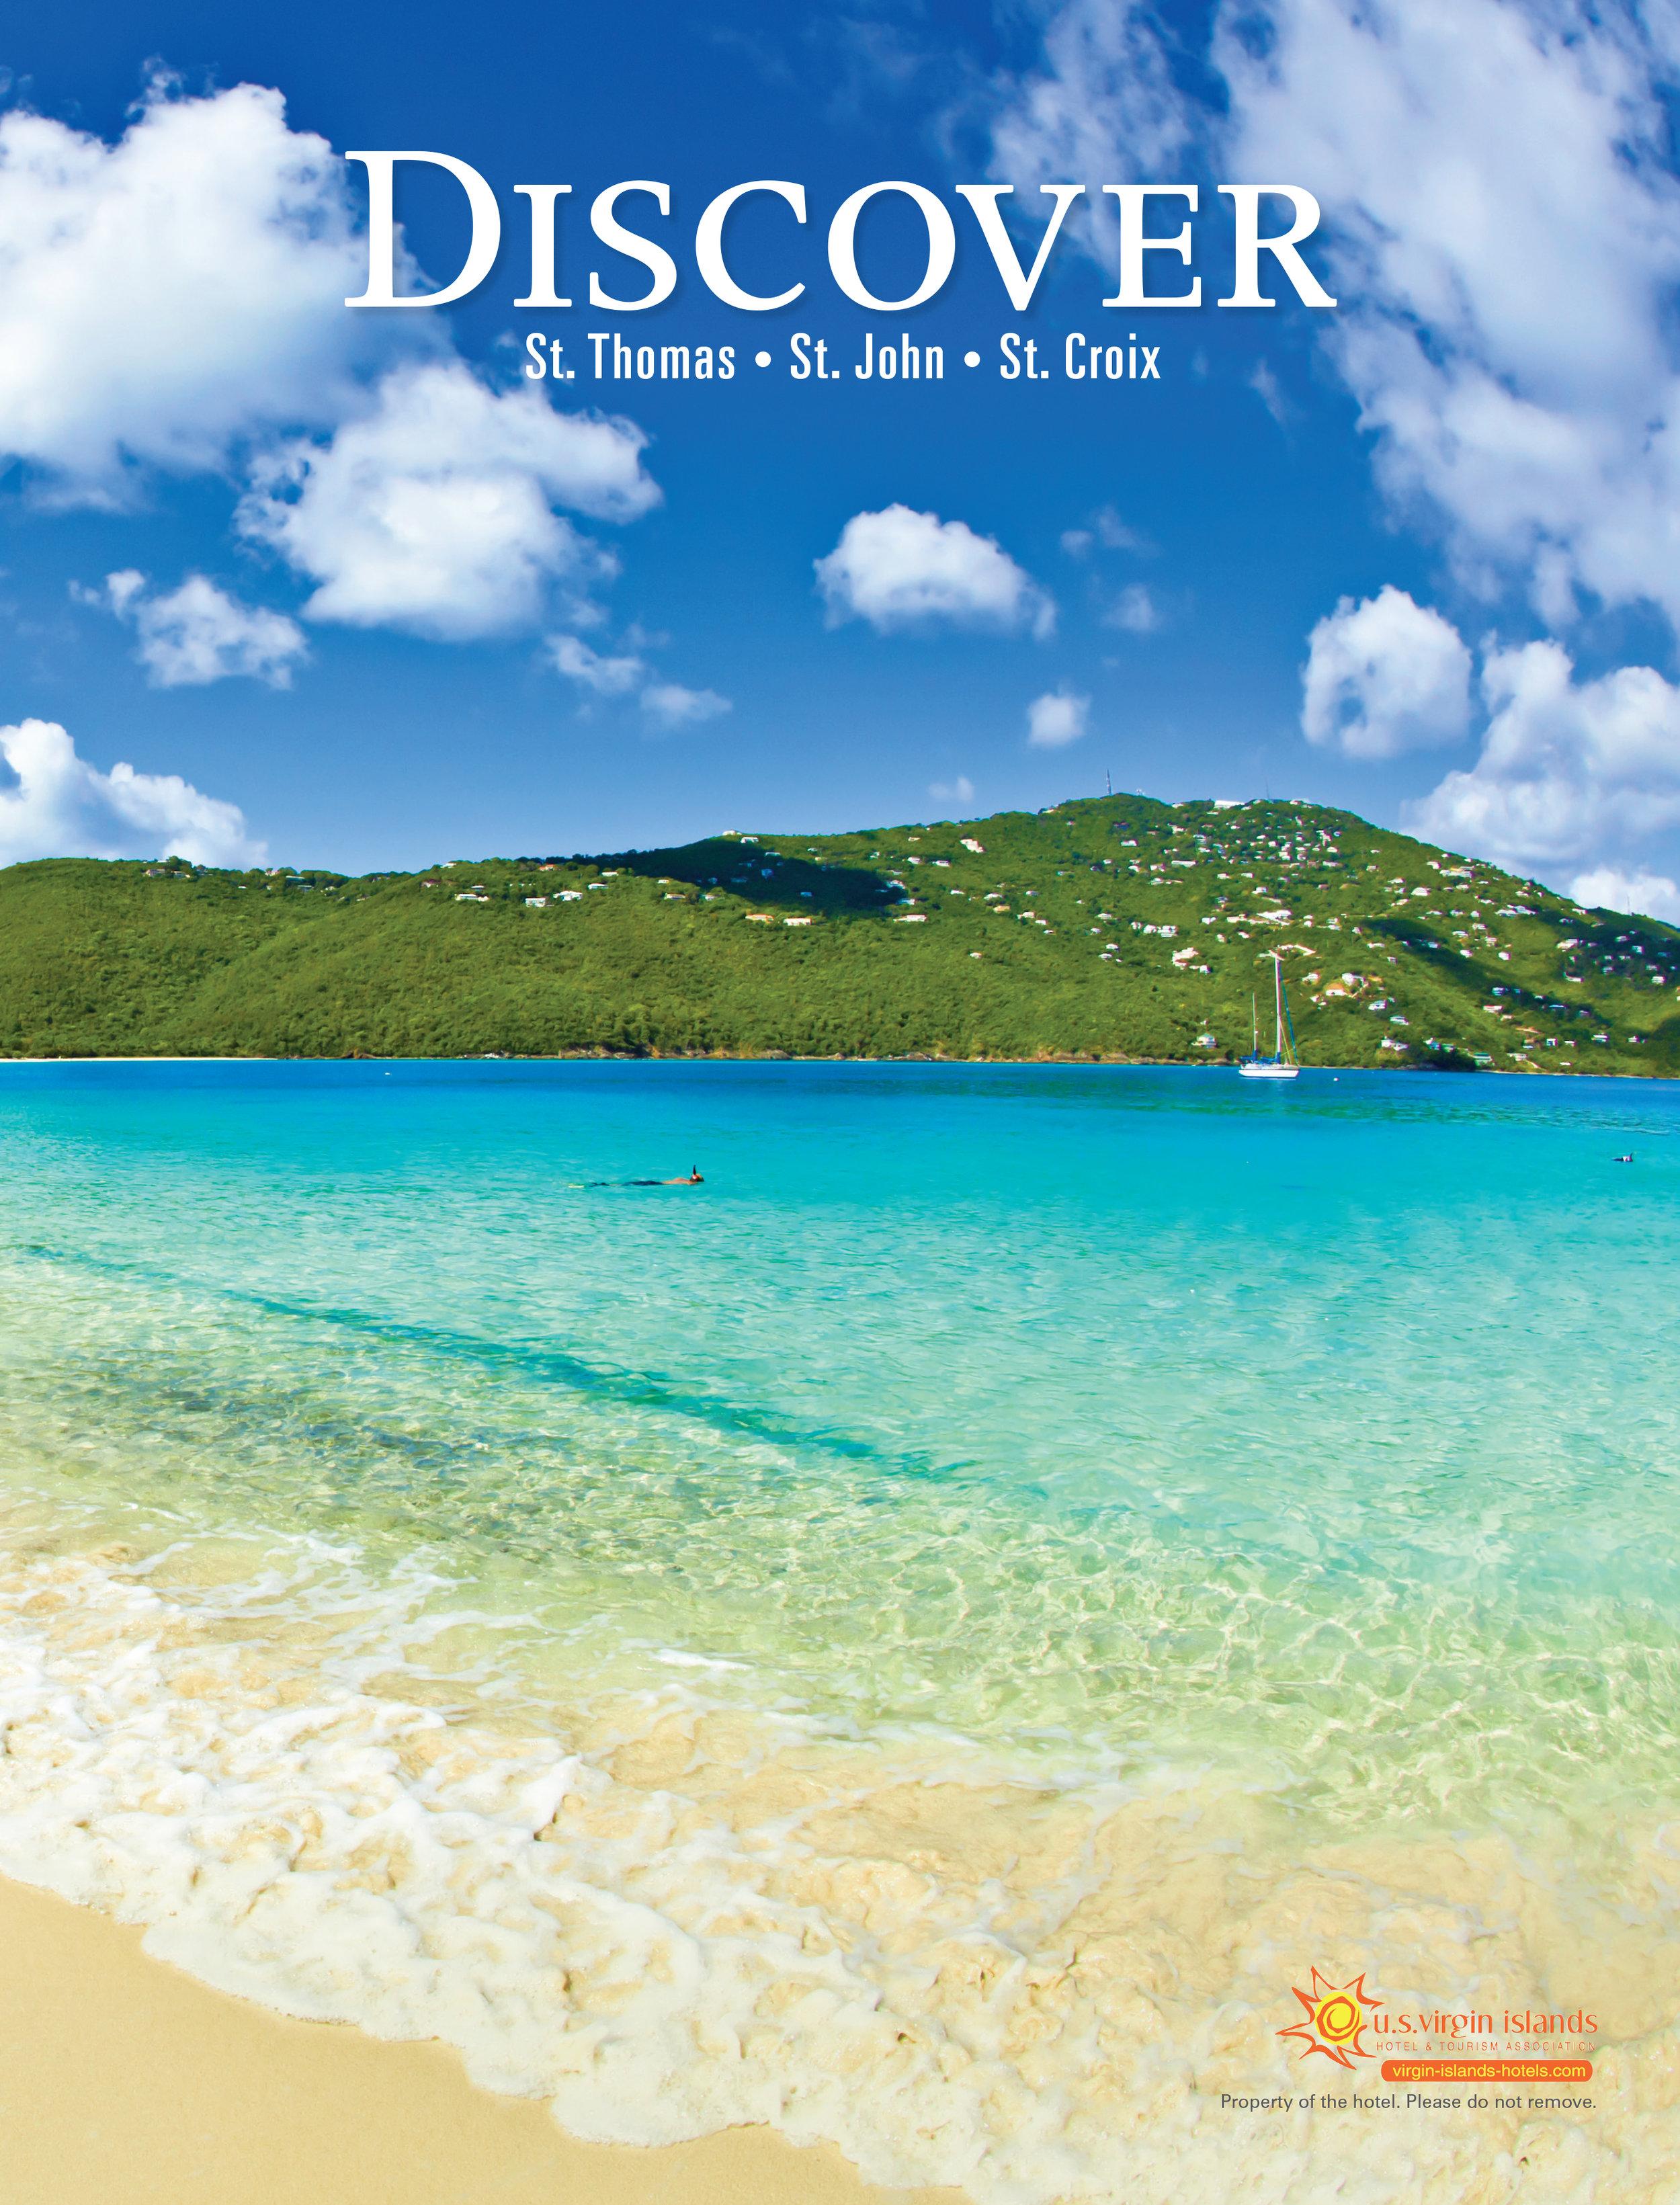 Discover St. Thomas, St. John, St. Croix